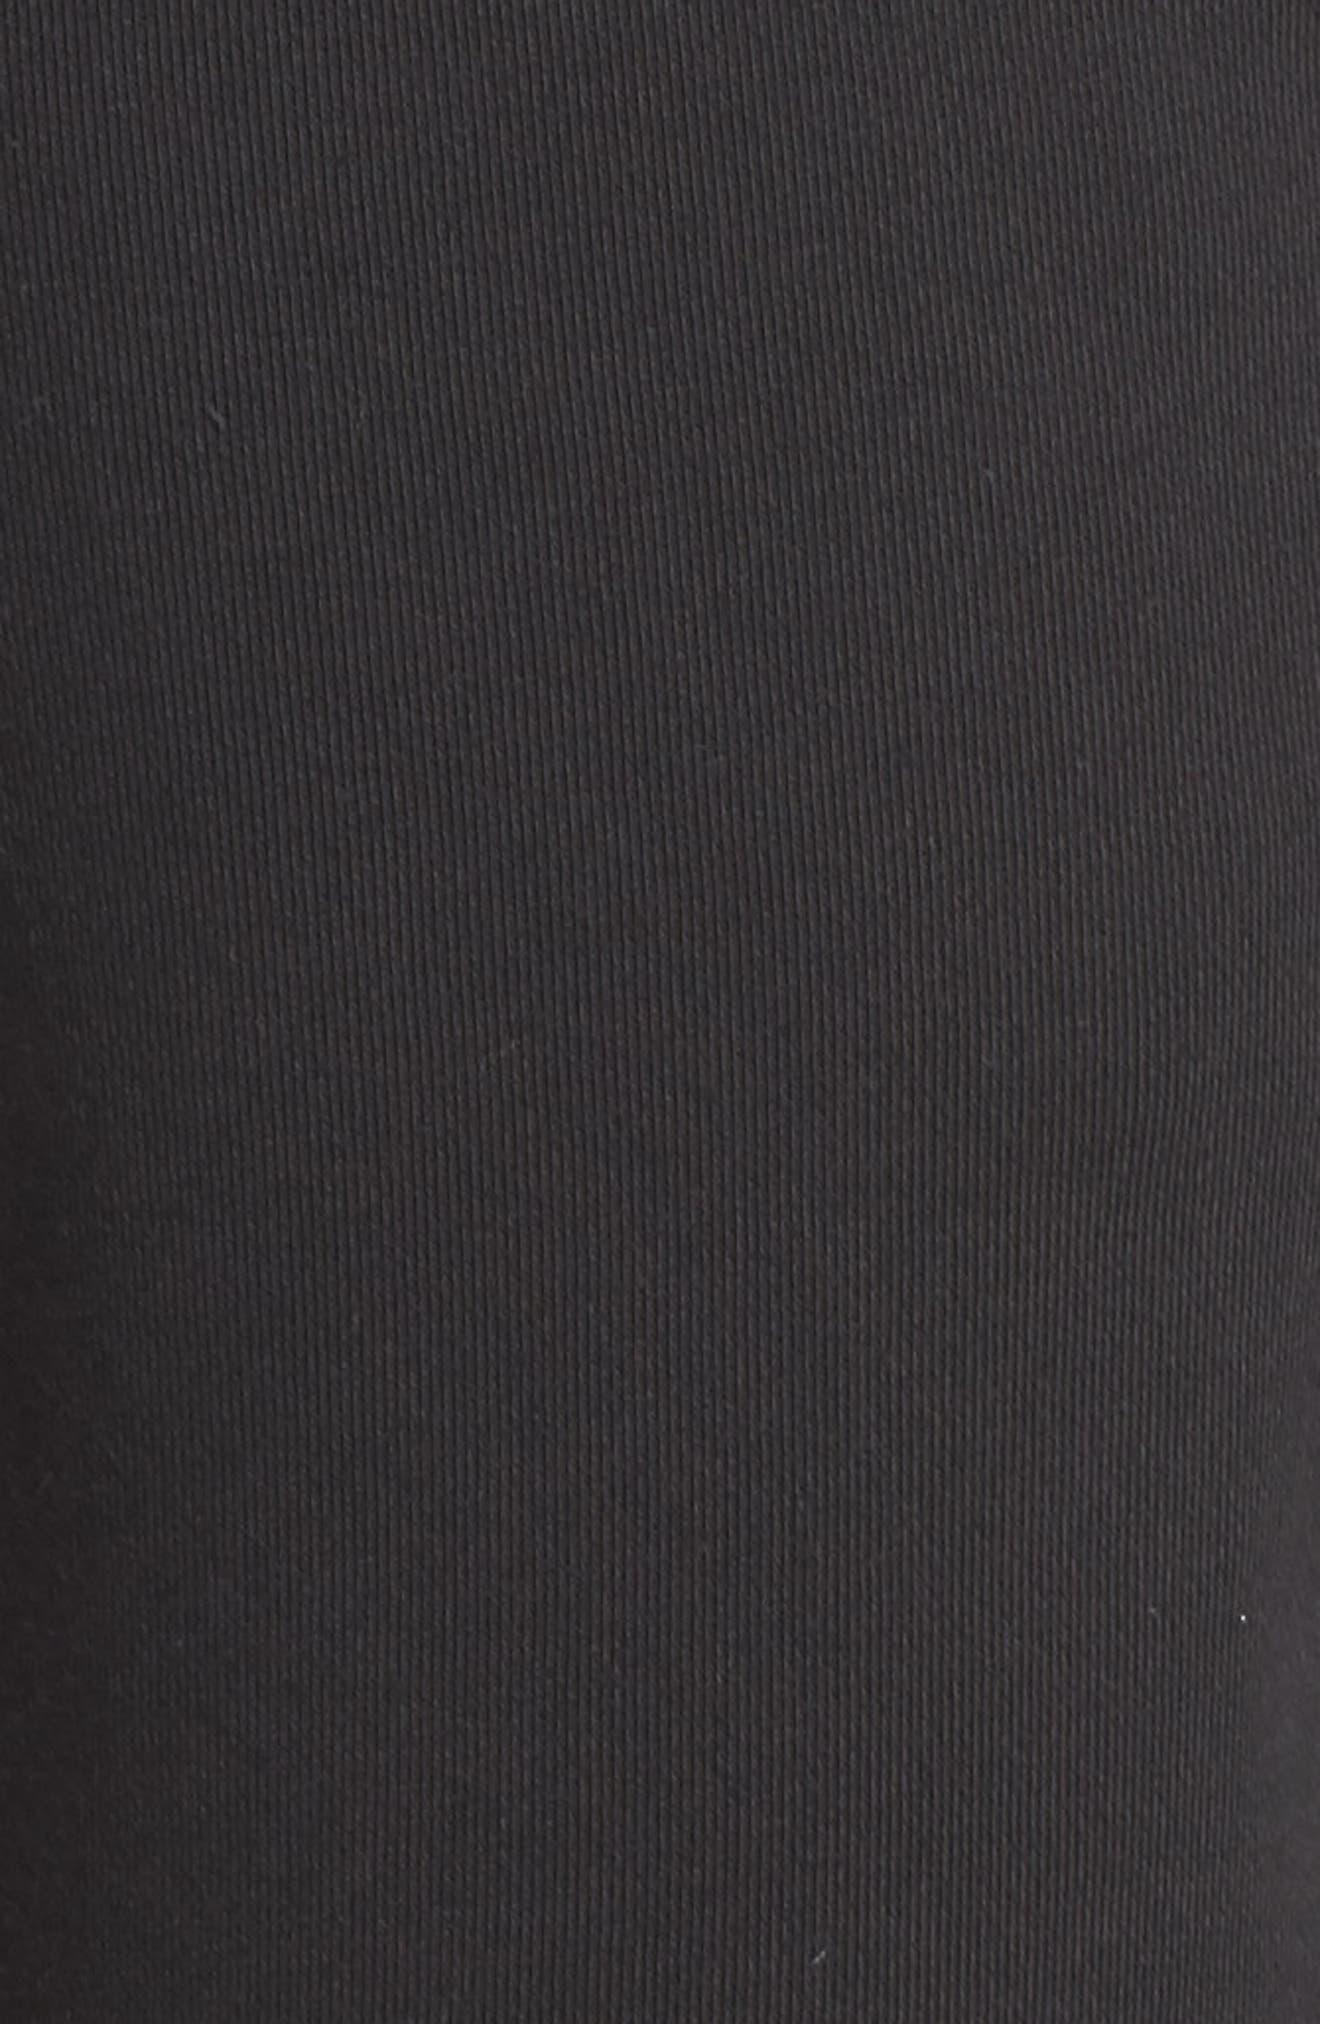 Sweatpants,                             Alternate thumbnail 6, color,                             005